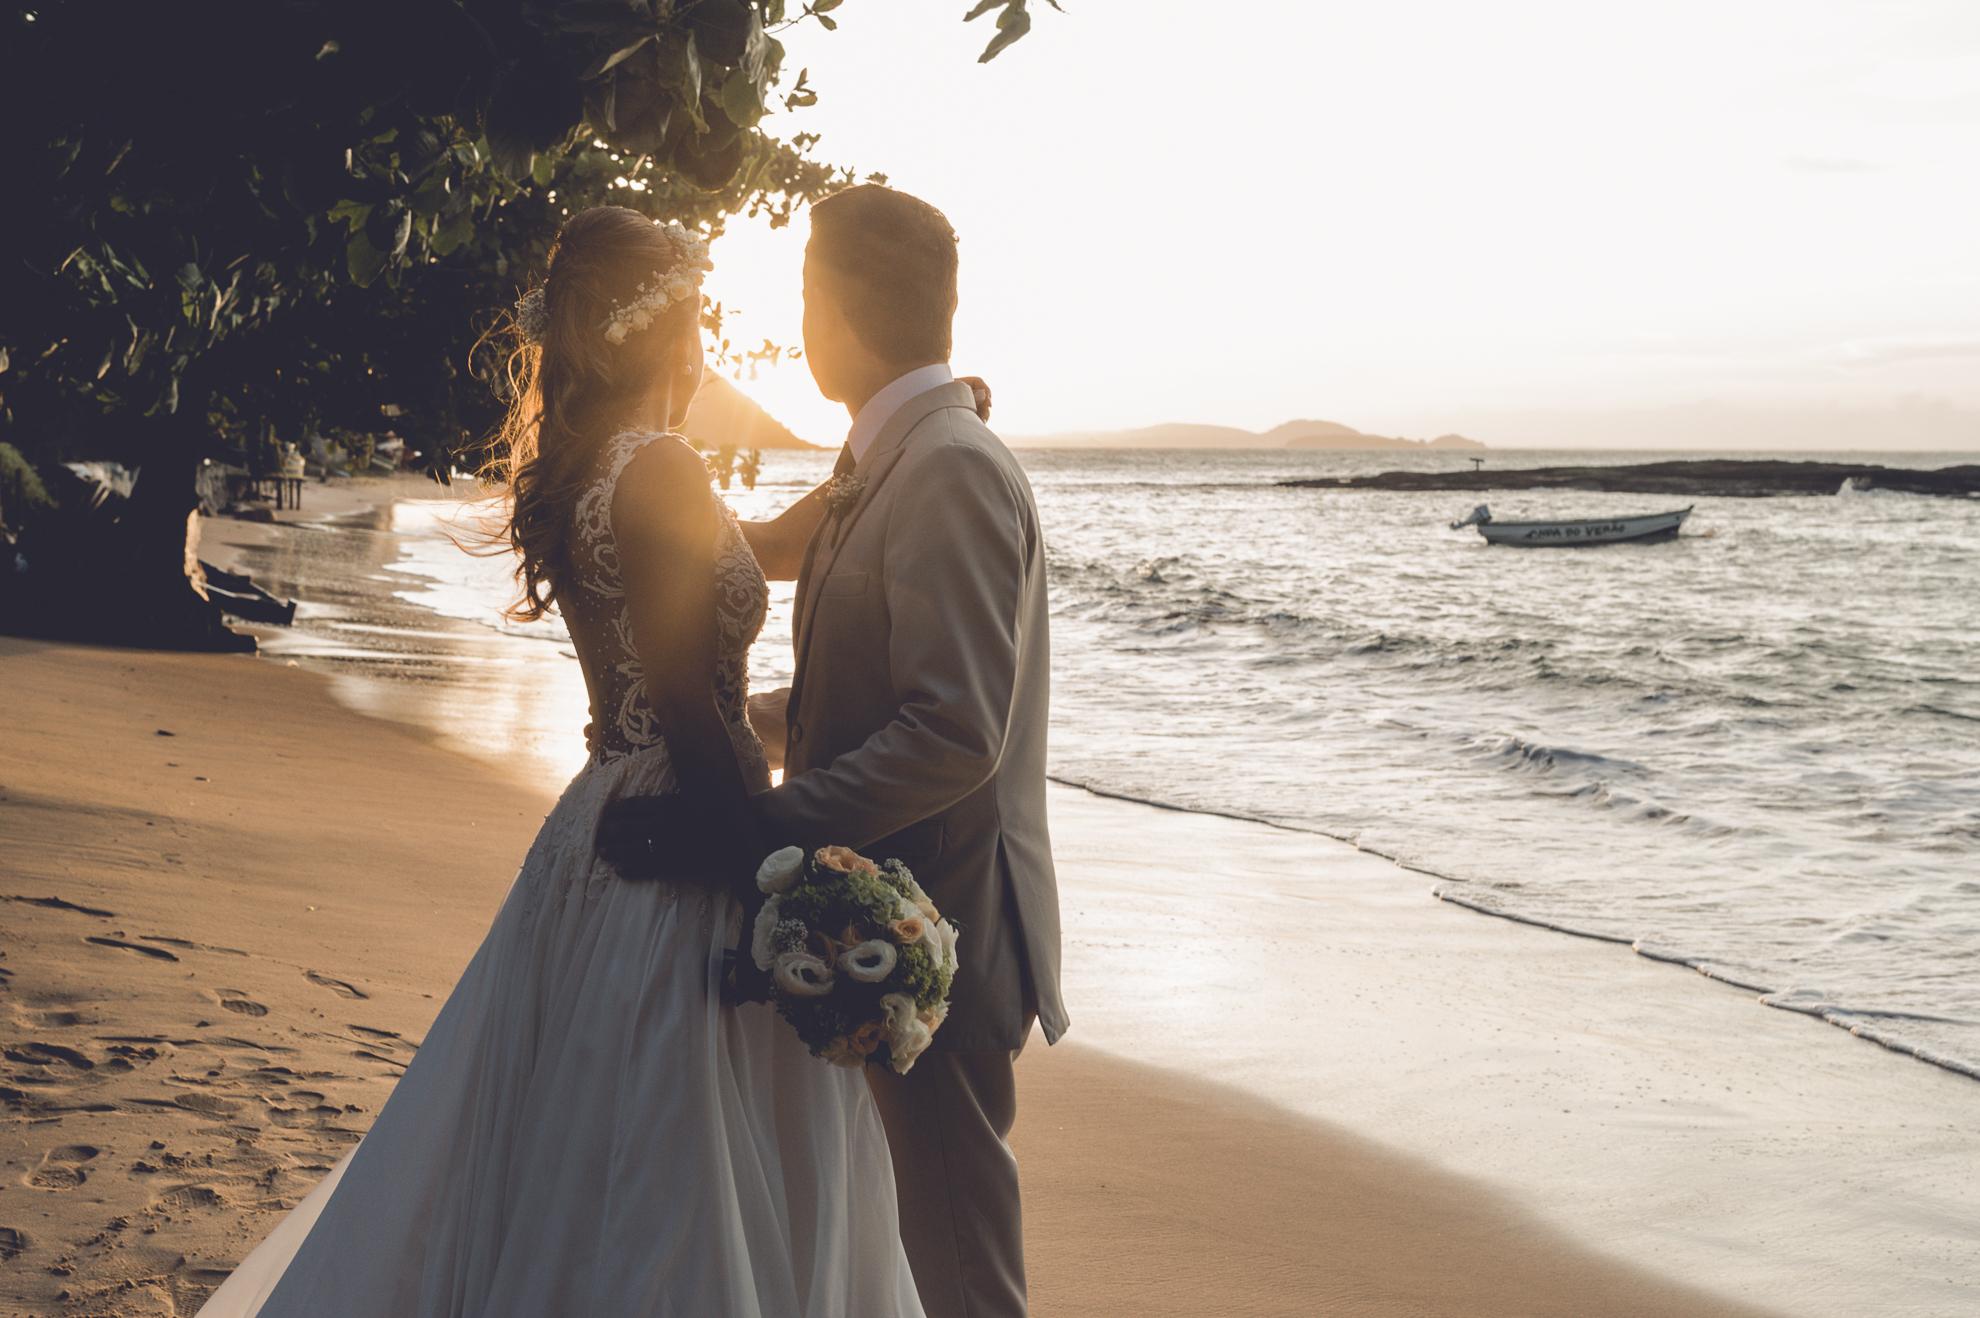 Pousada Praia da Tartaruga - Priscila & Guilherme (79)